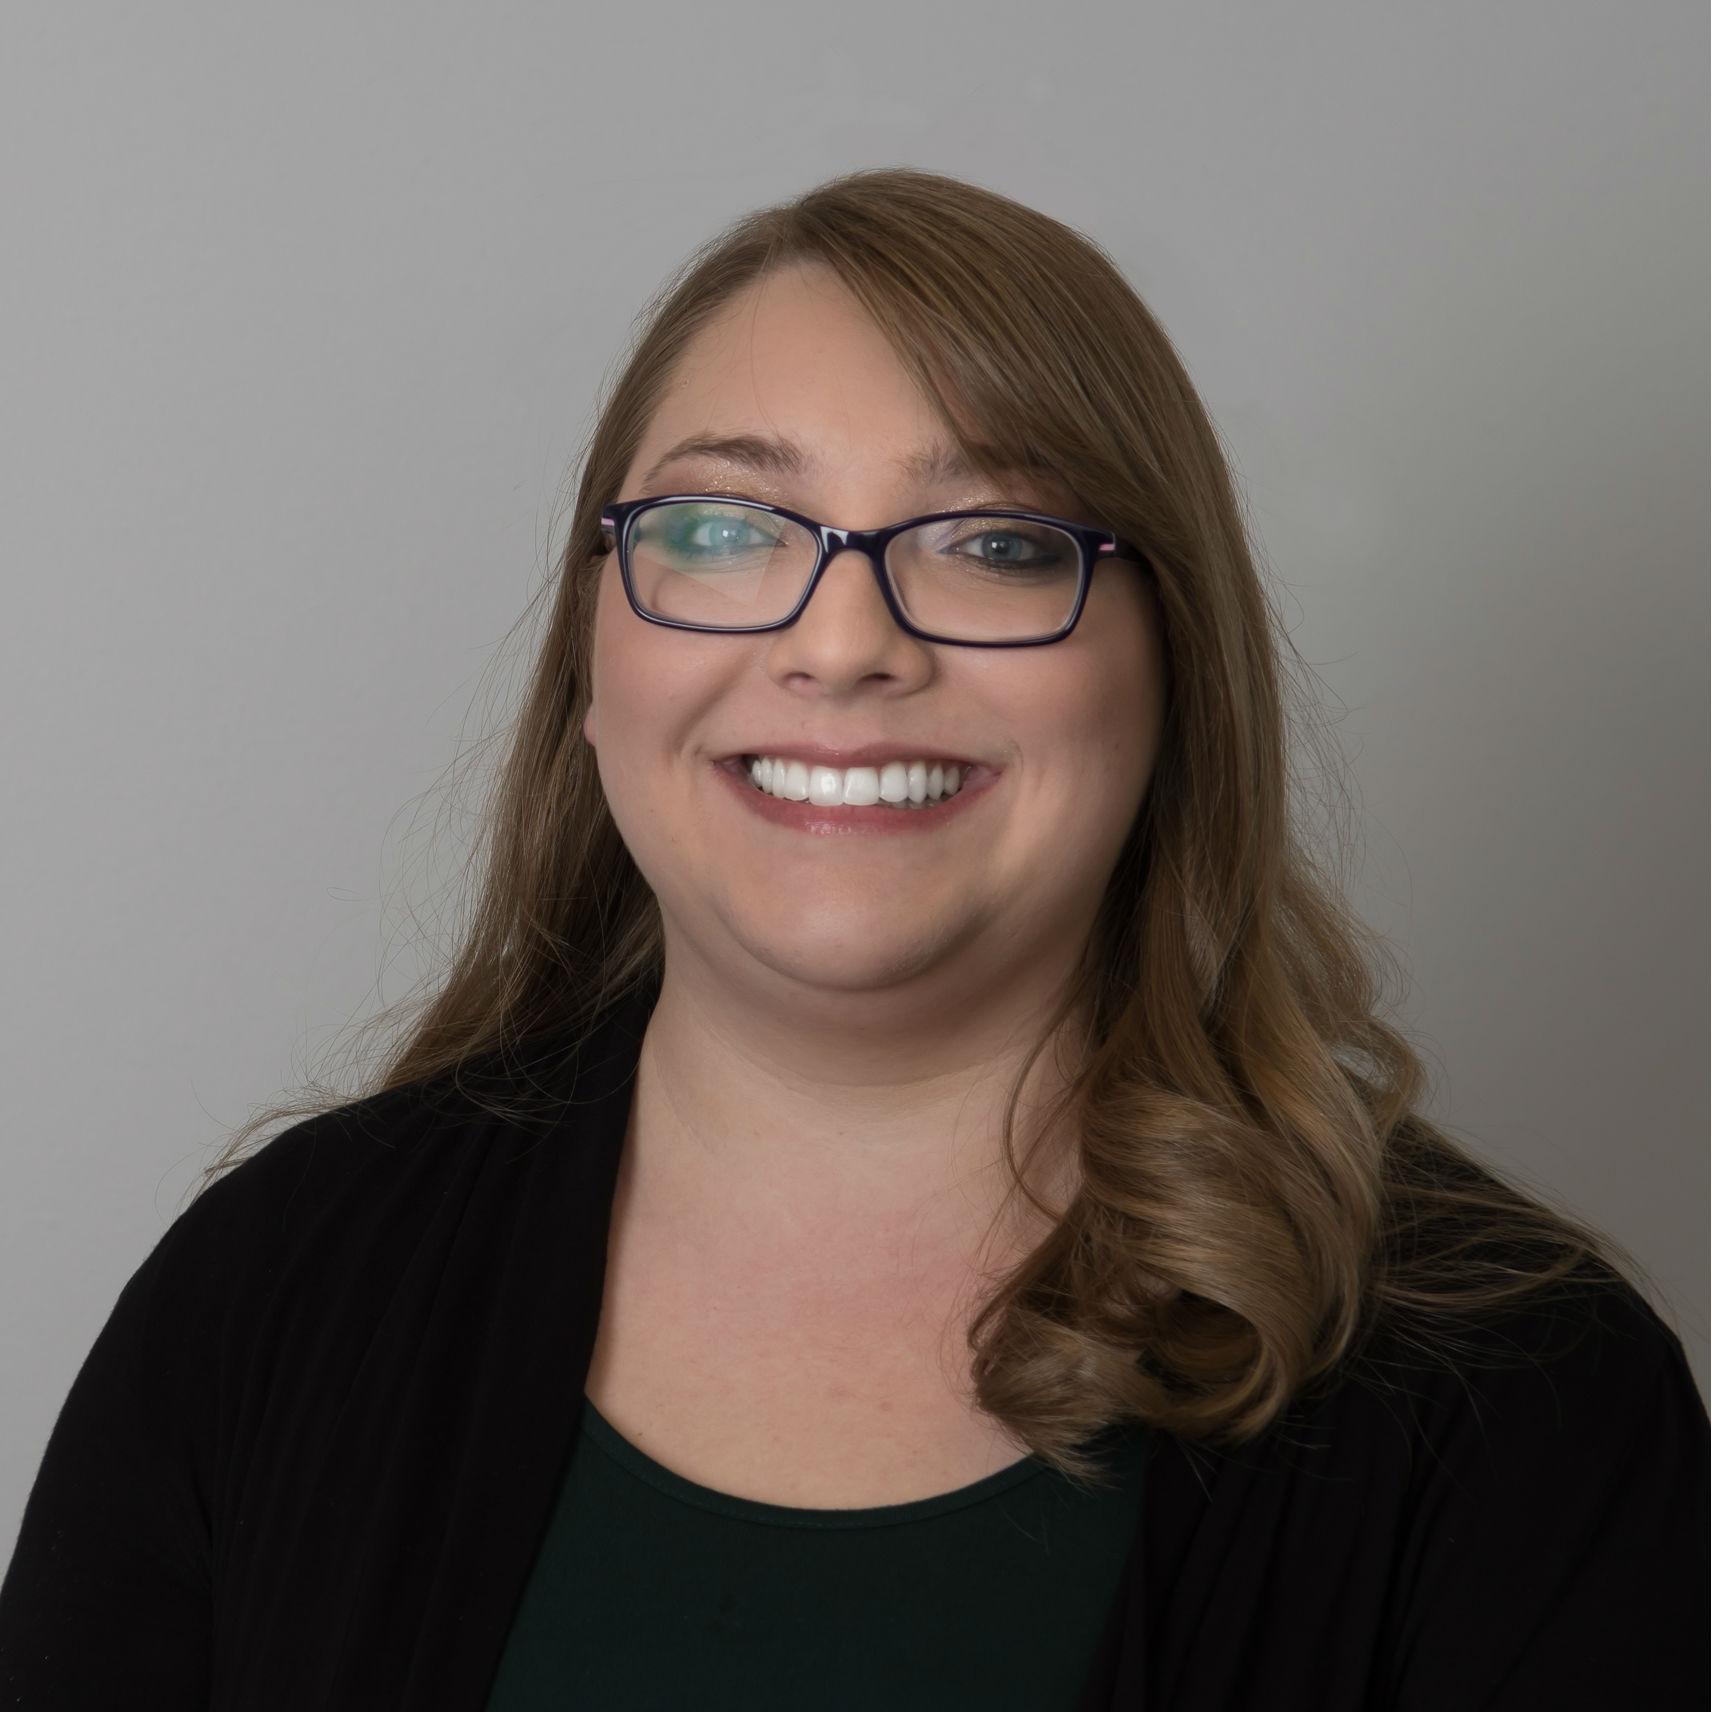 Breanna Blanchard - Lead Schedulerbreanna@medconnectpro.com(503) 922-2160 ext. 302(971) 205-7788 (direct)